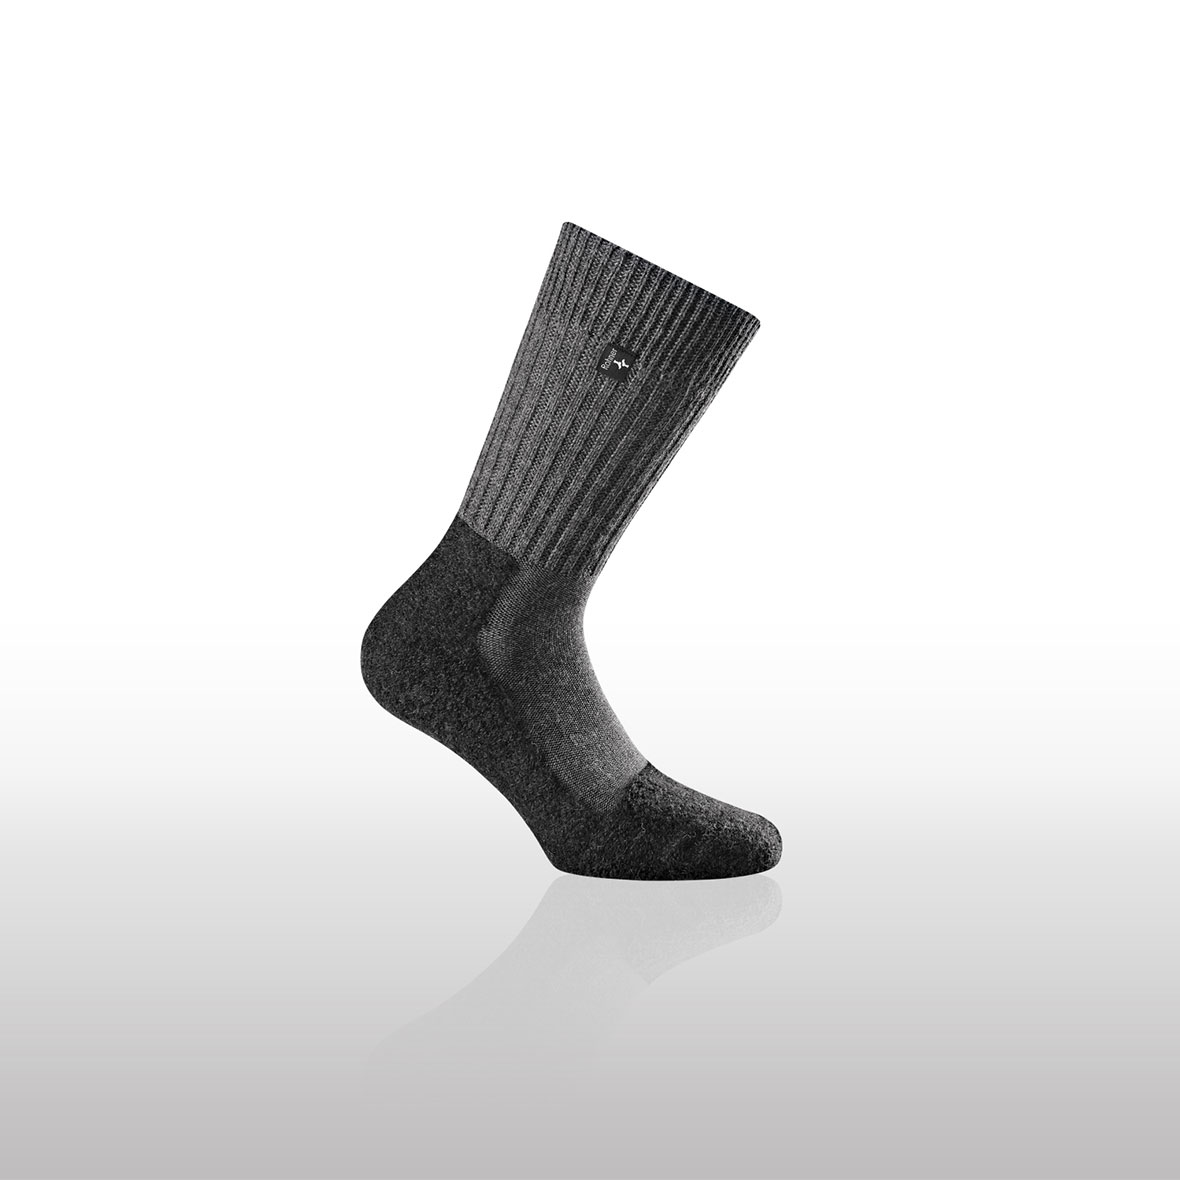 Wandersocken original, Rohner Socken, grau